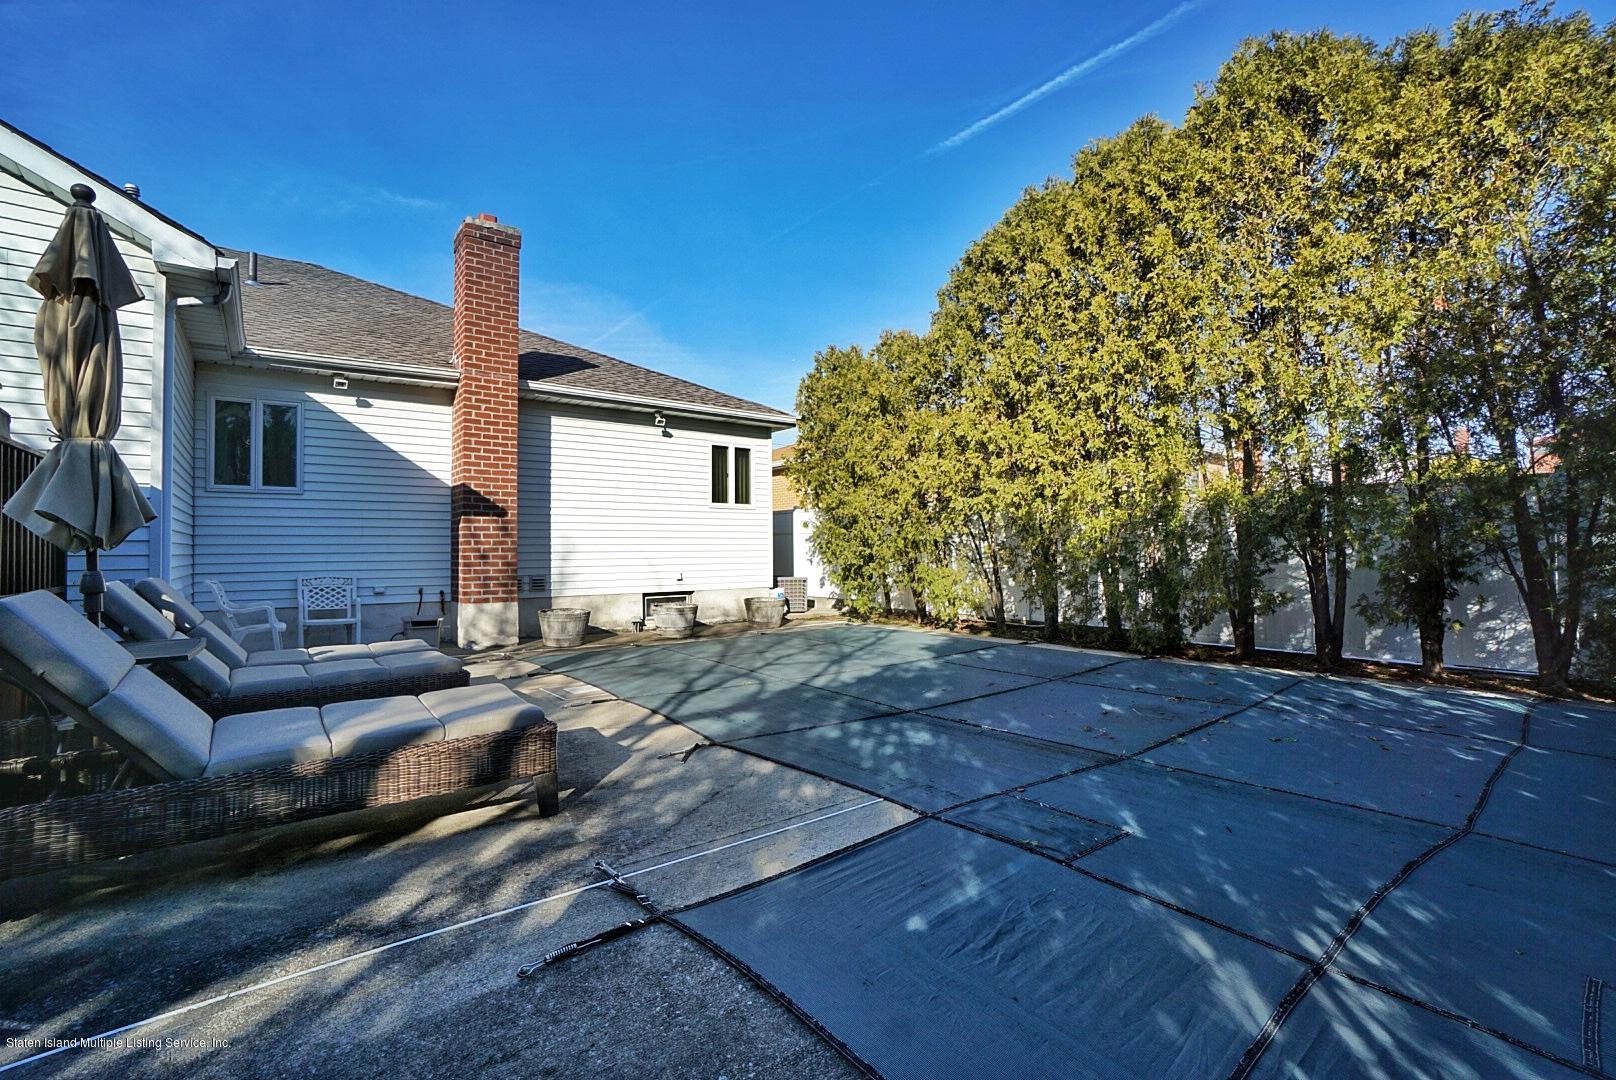 Single Family - Detached 183 Kensington Avenue  Staten Island, NY 10305, MLS-1127107-34